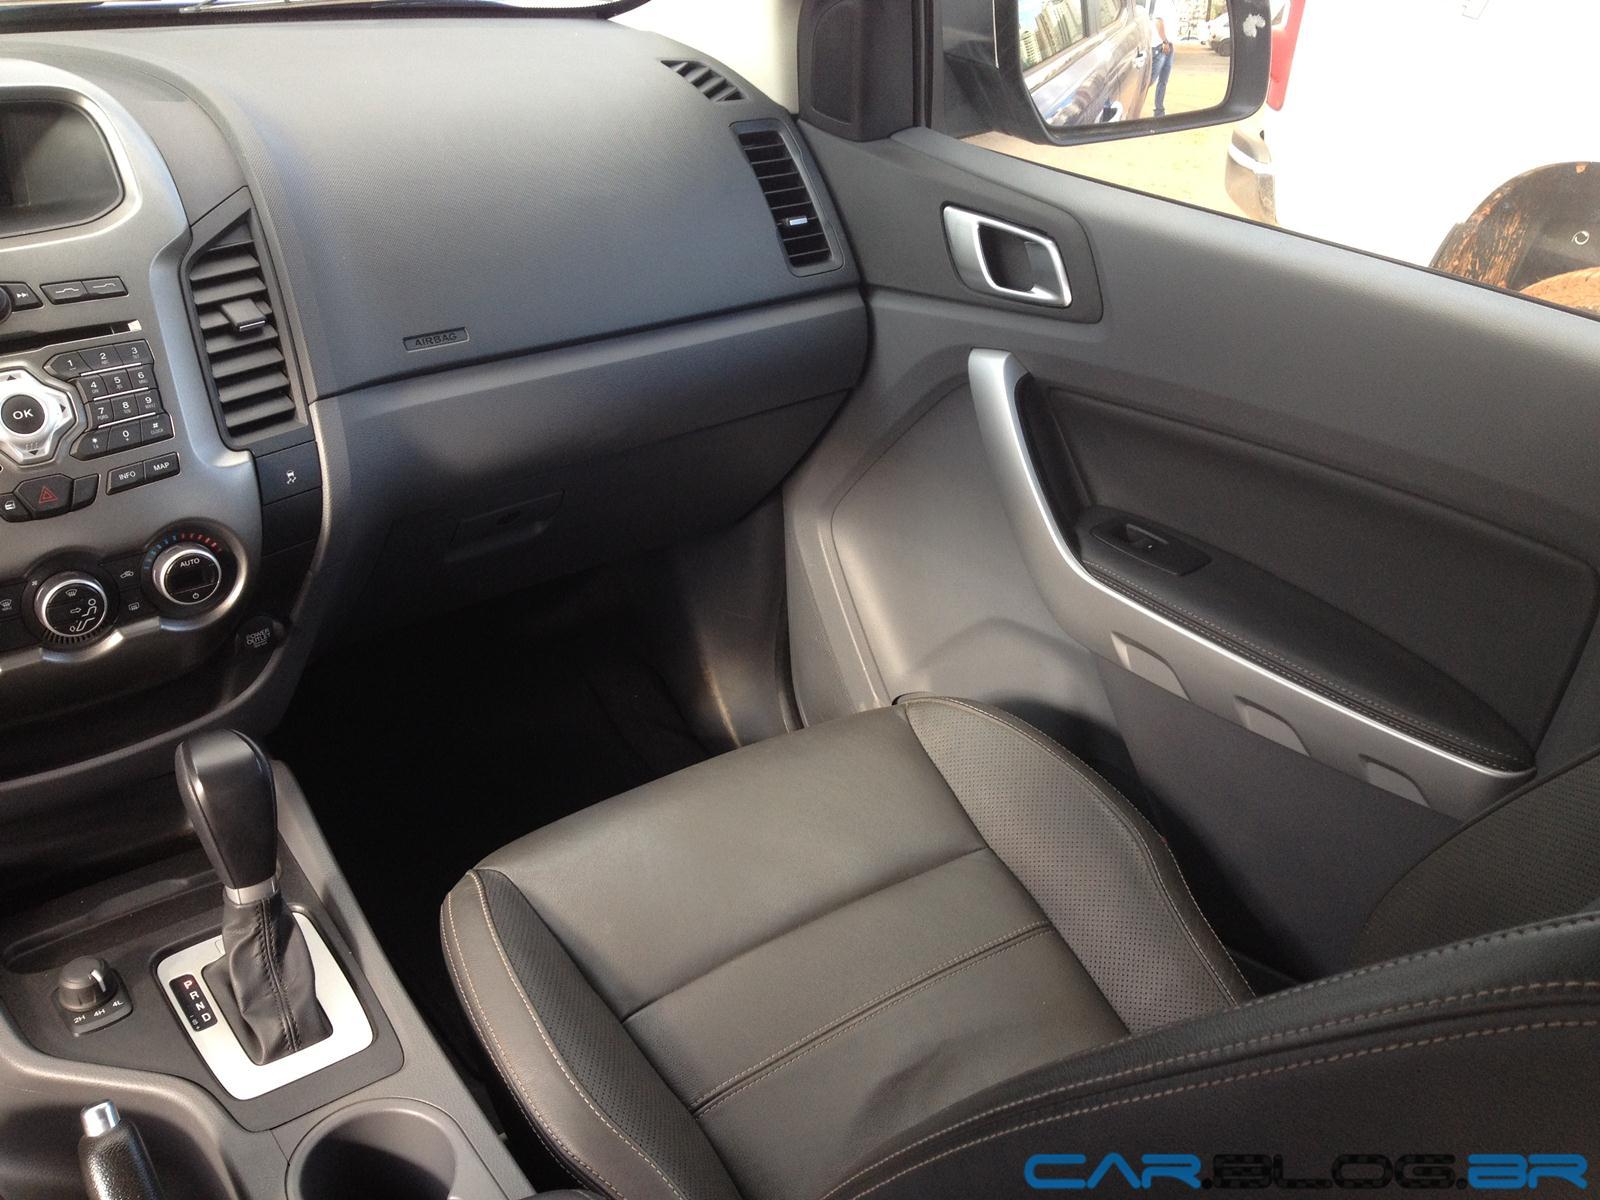 http://3.bp.blogspot.com/-BQnOYN9IEbY/UDEWxrPBMvI/AAAAAAAAaso/FHrZ3Rd5nZs/s1600/Nova-Ford-Ranger-2013-Limited-interior%20(9).JPG